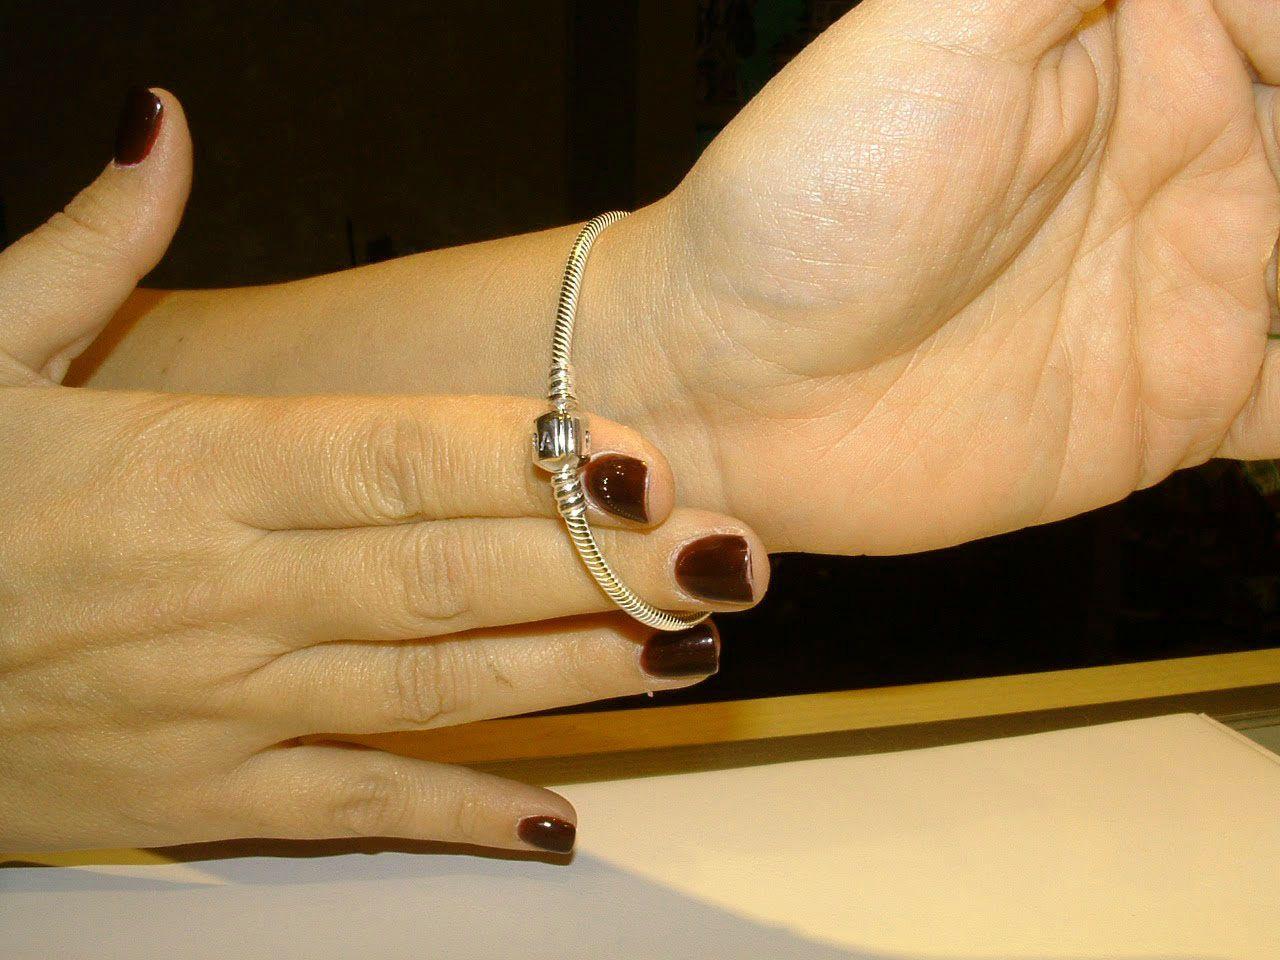 Swag How To Style A Pandora Bracelet In Three Easy Lessons Pandora Bracelet Pandora Bracelet Charms Pandora Bracelets